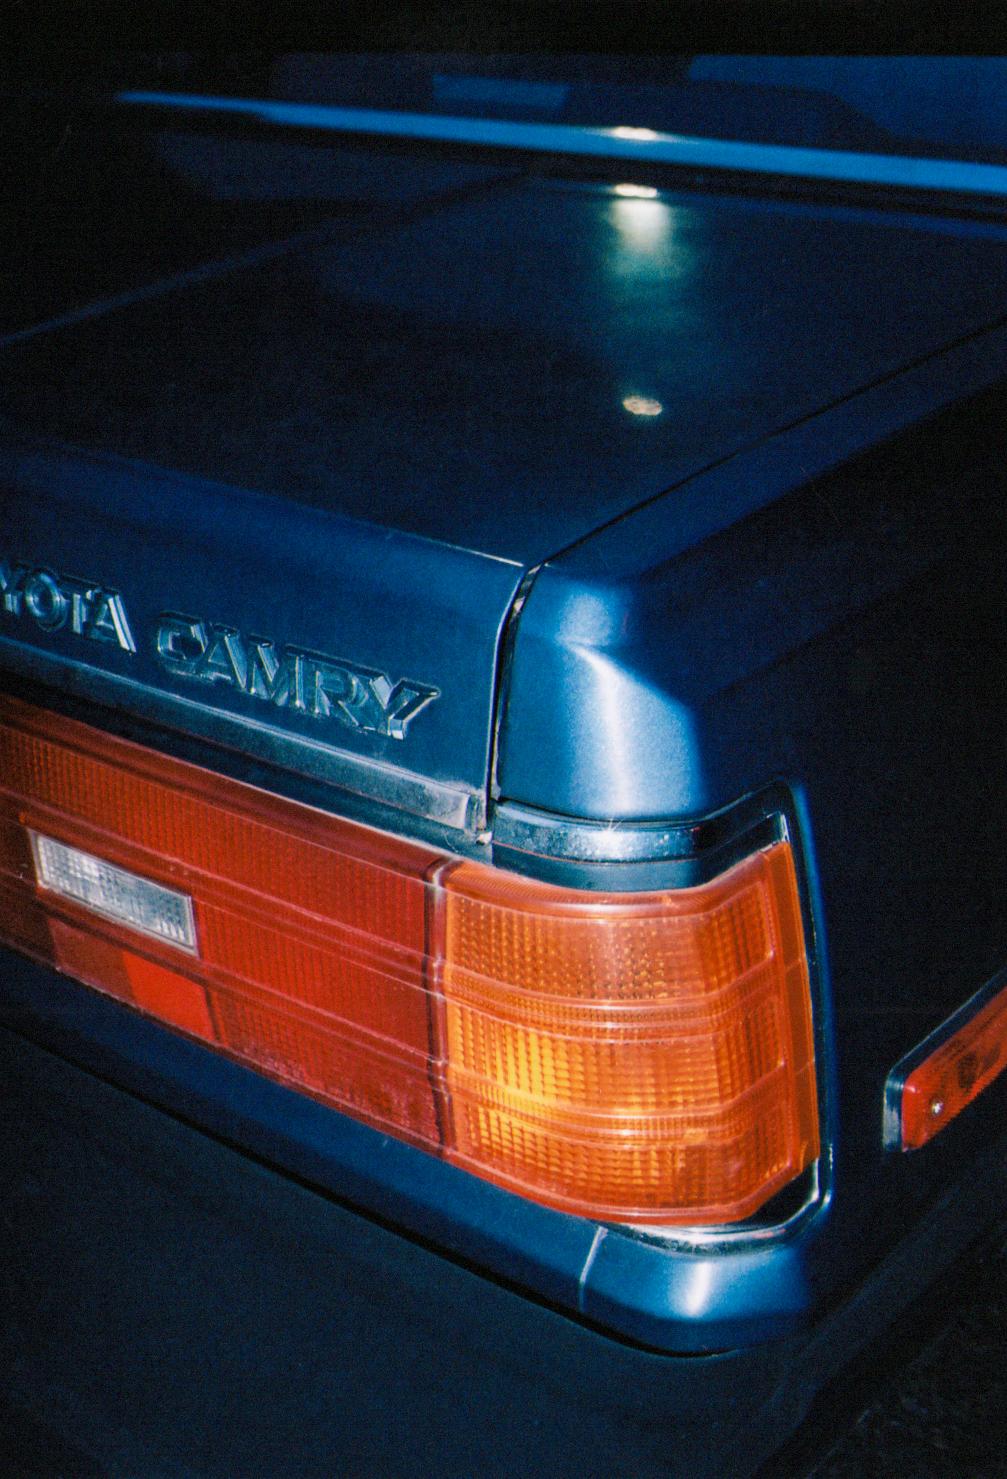 Toyota Camery.jpg